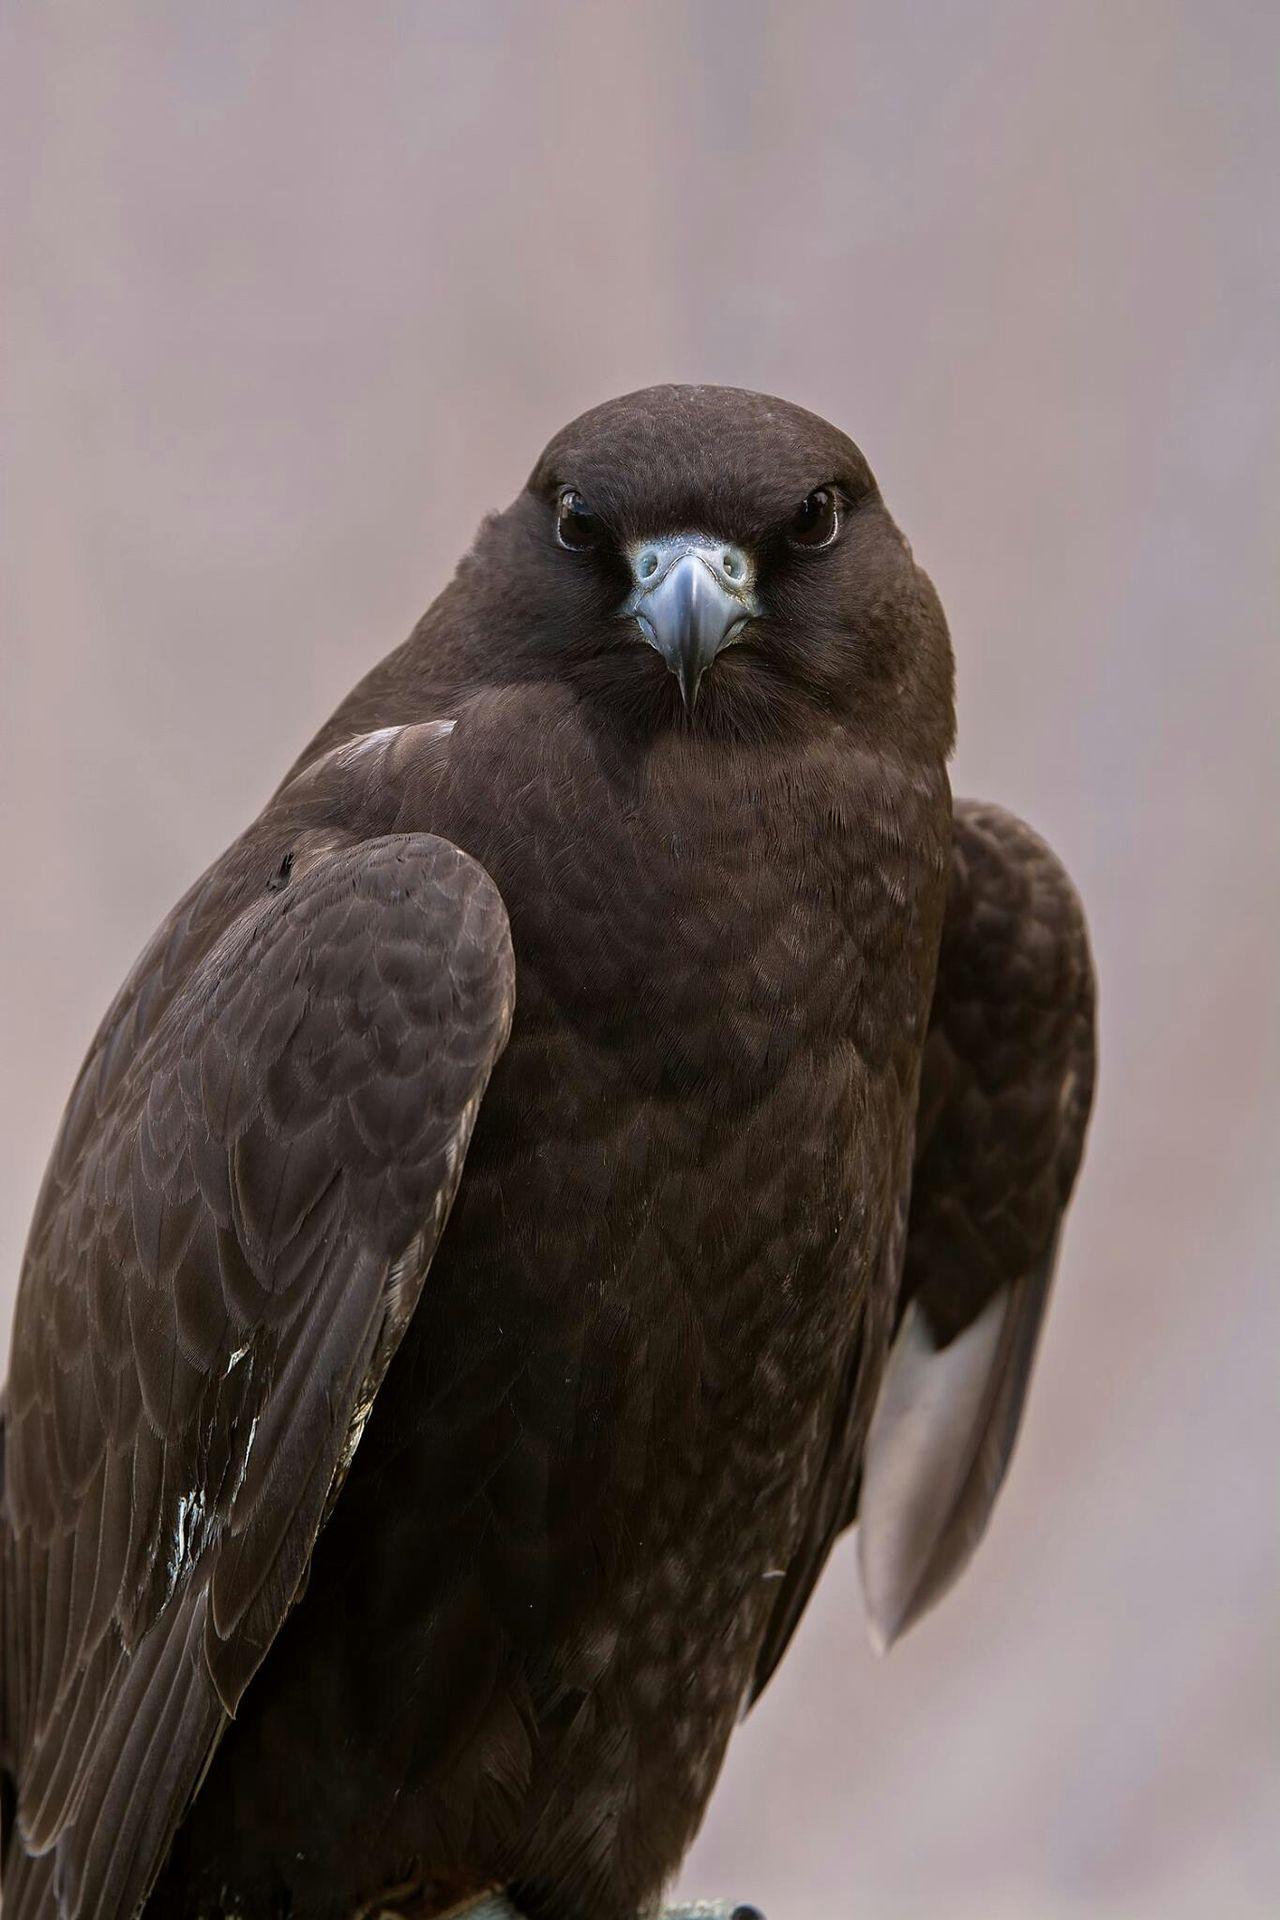 Rapace  Oiseaux Bird Of Prey Animaux Bird Predatory Wildlife & Nature Photo Around You France Predator